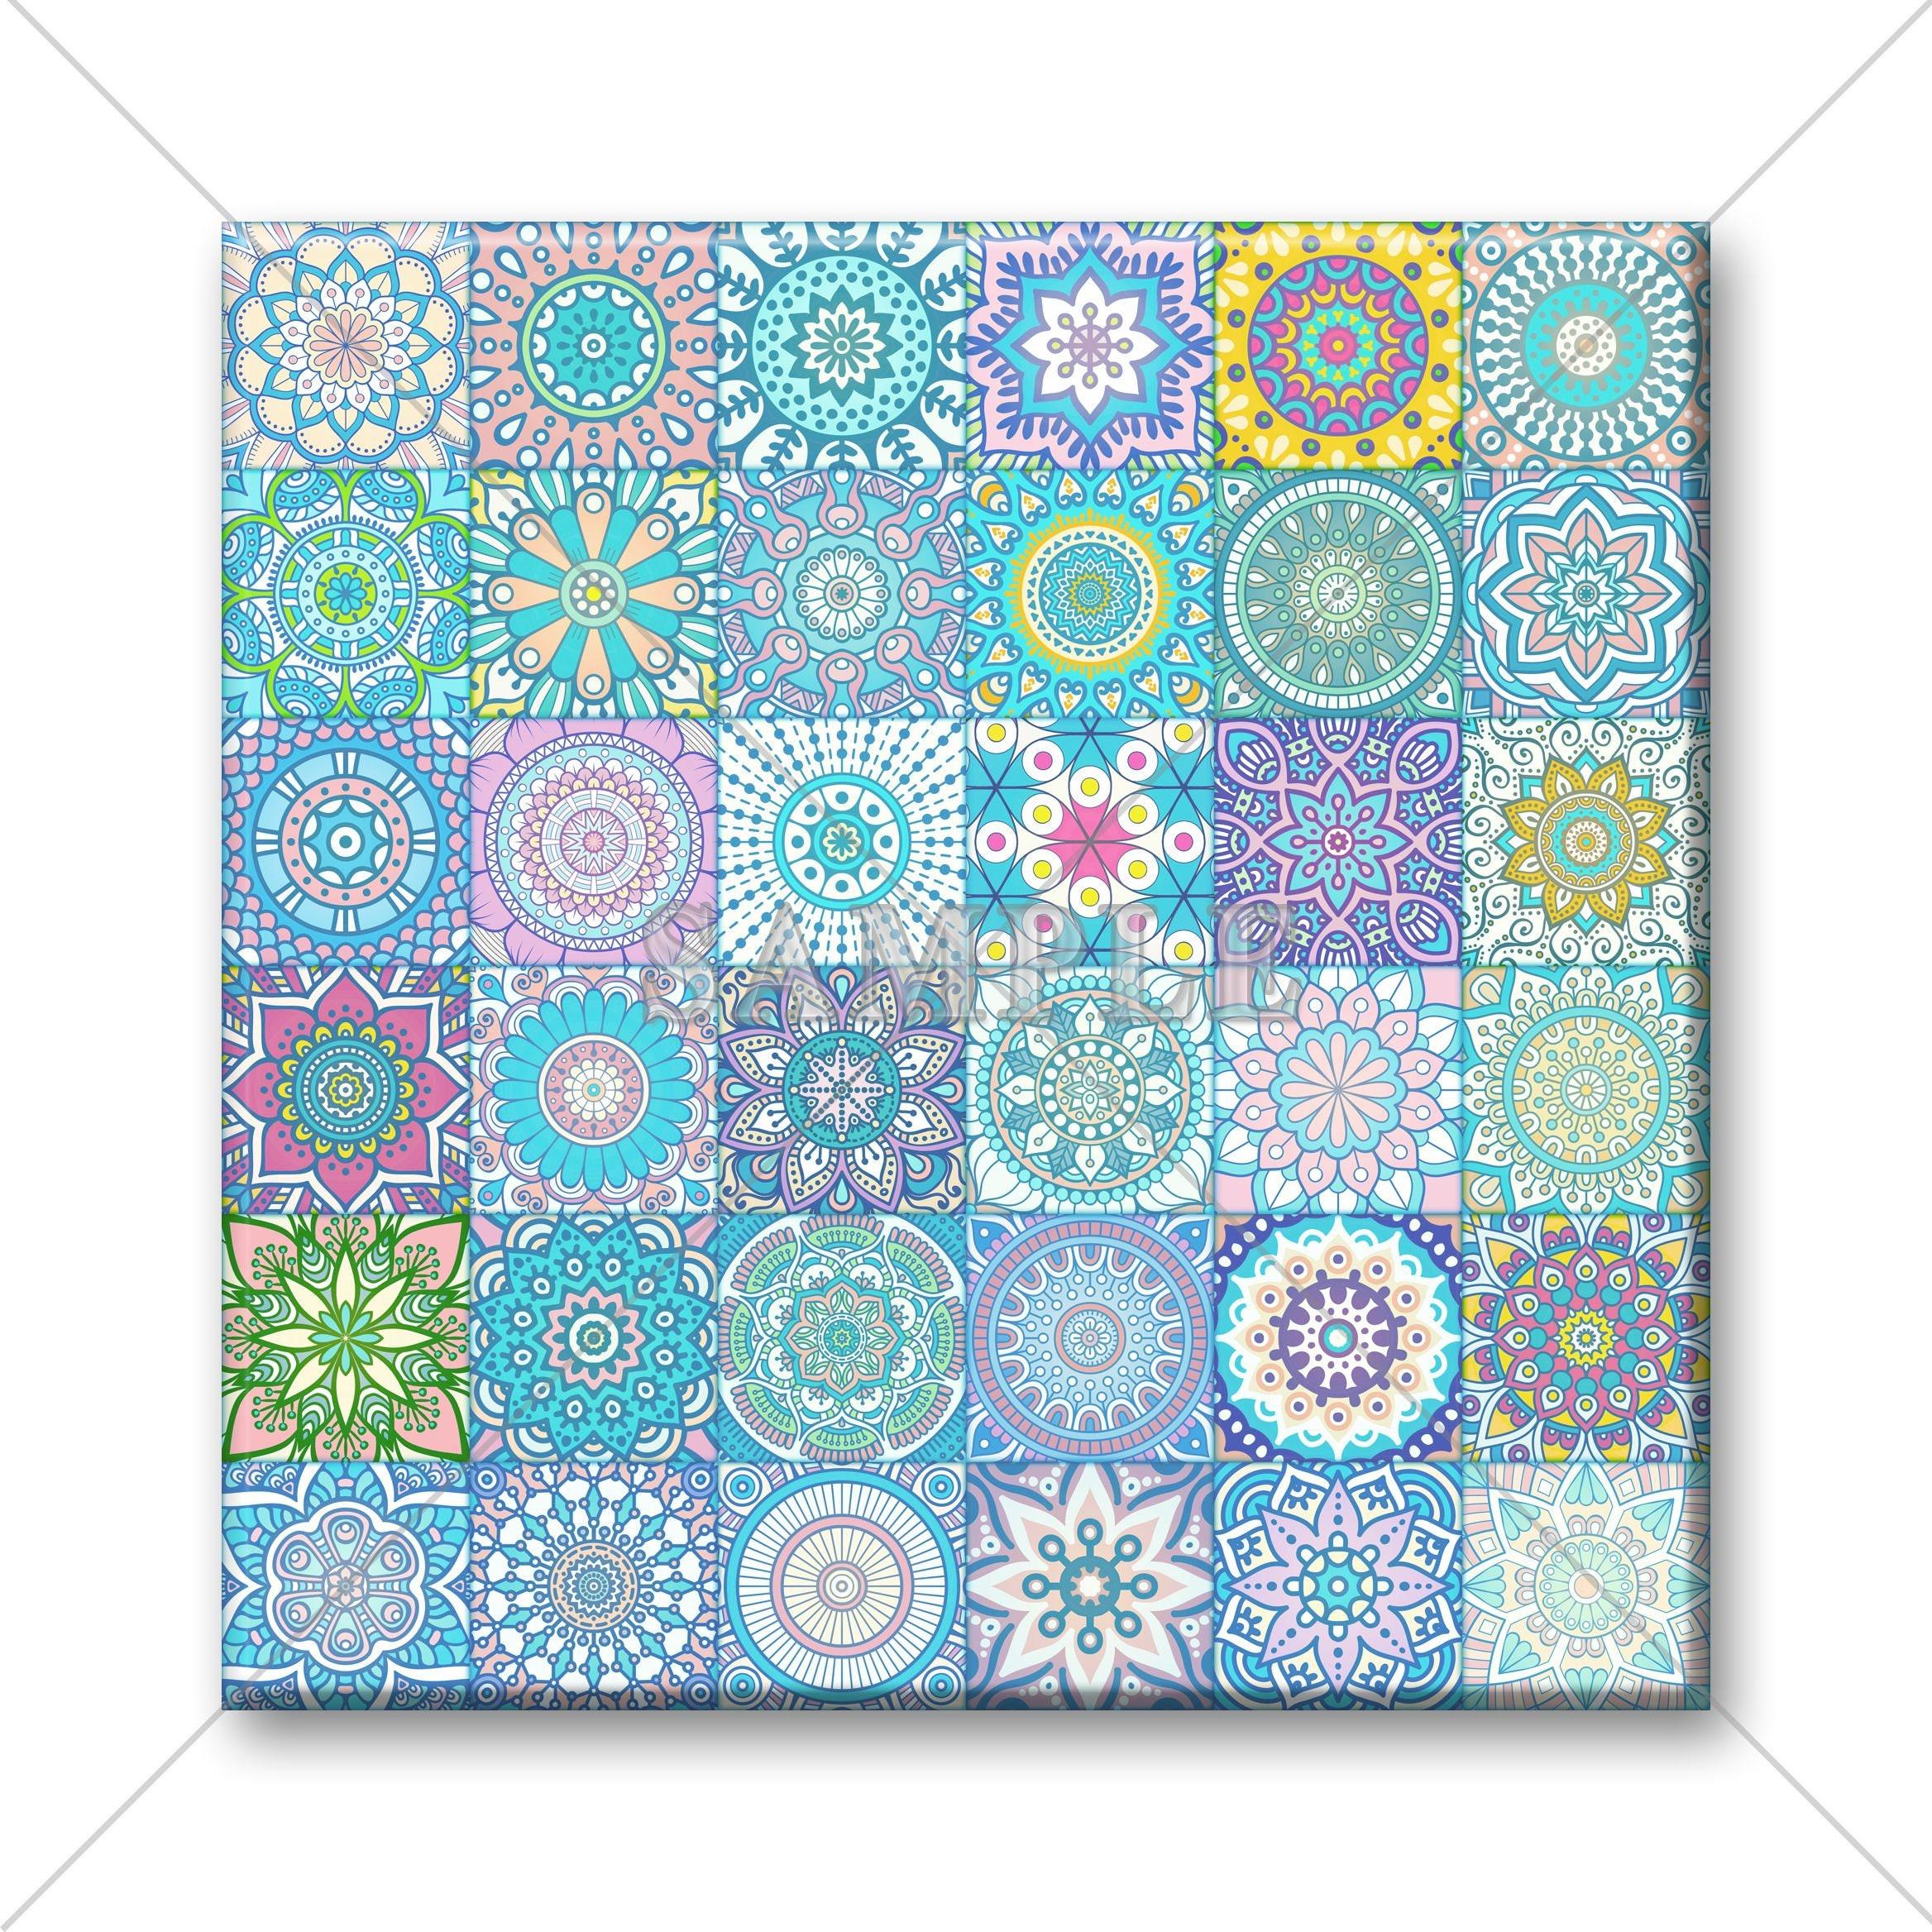 Decorative Ceramic Tile Mosaic Moroccan Tile Design Vintage | Etsy